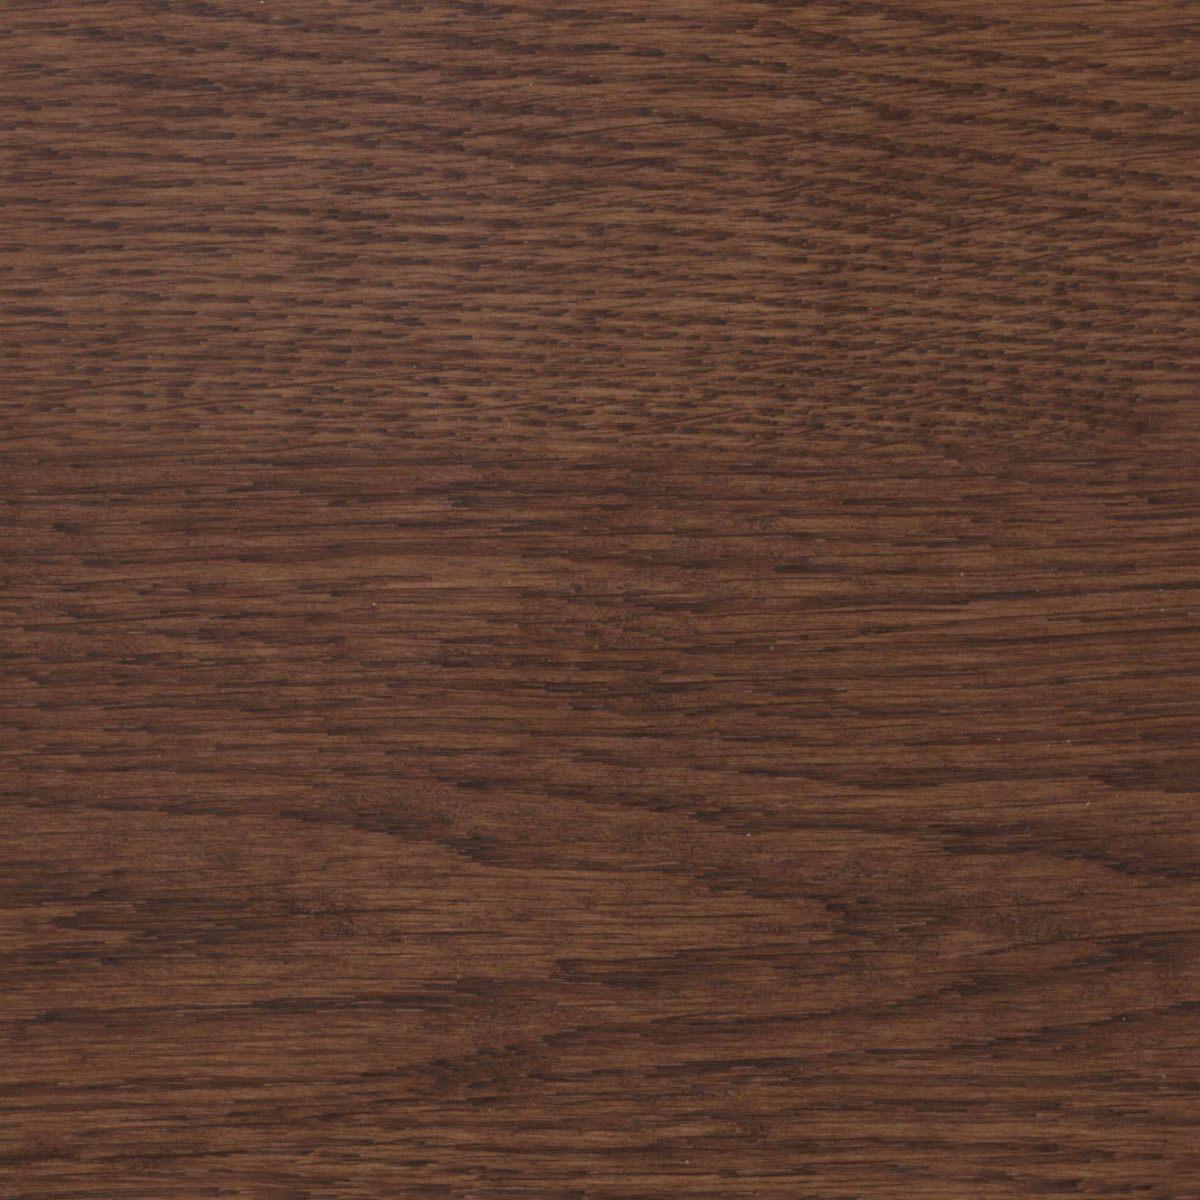 64A Oak Wood Sample